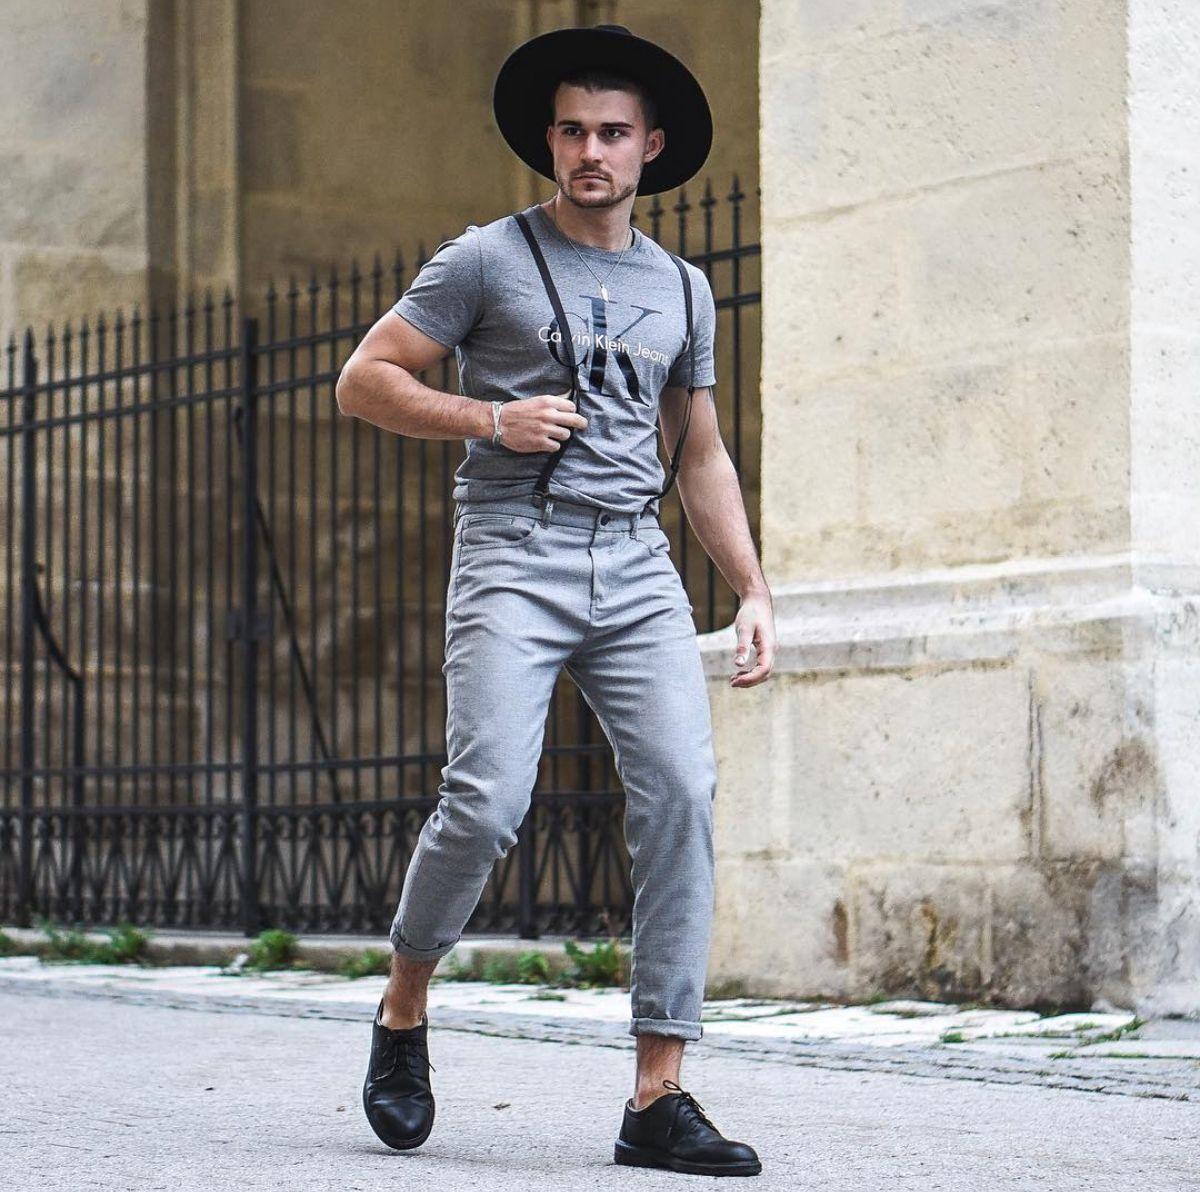 Chapéu Fedora masculino: O que é? Como usar?   Roupa urbana